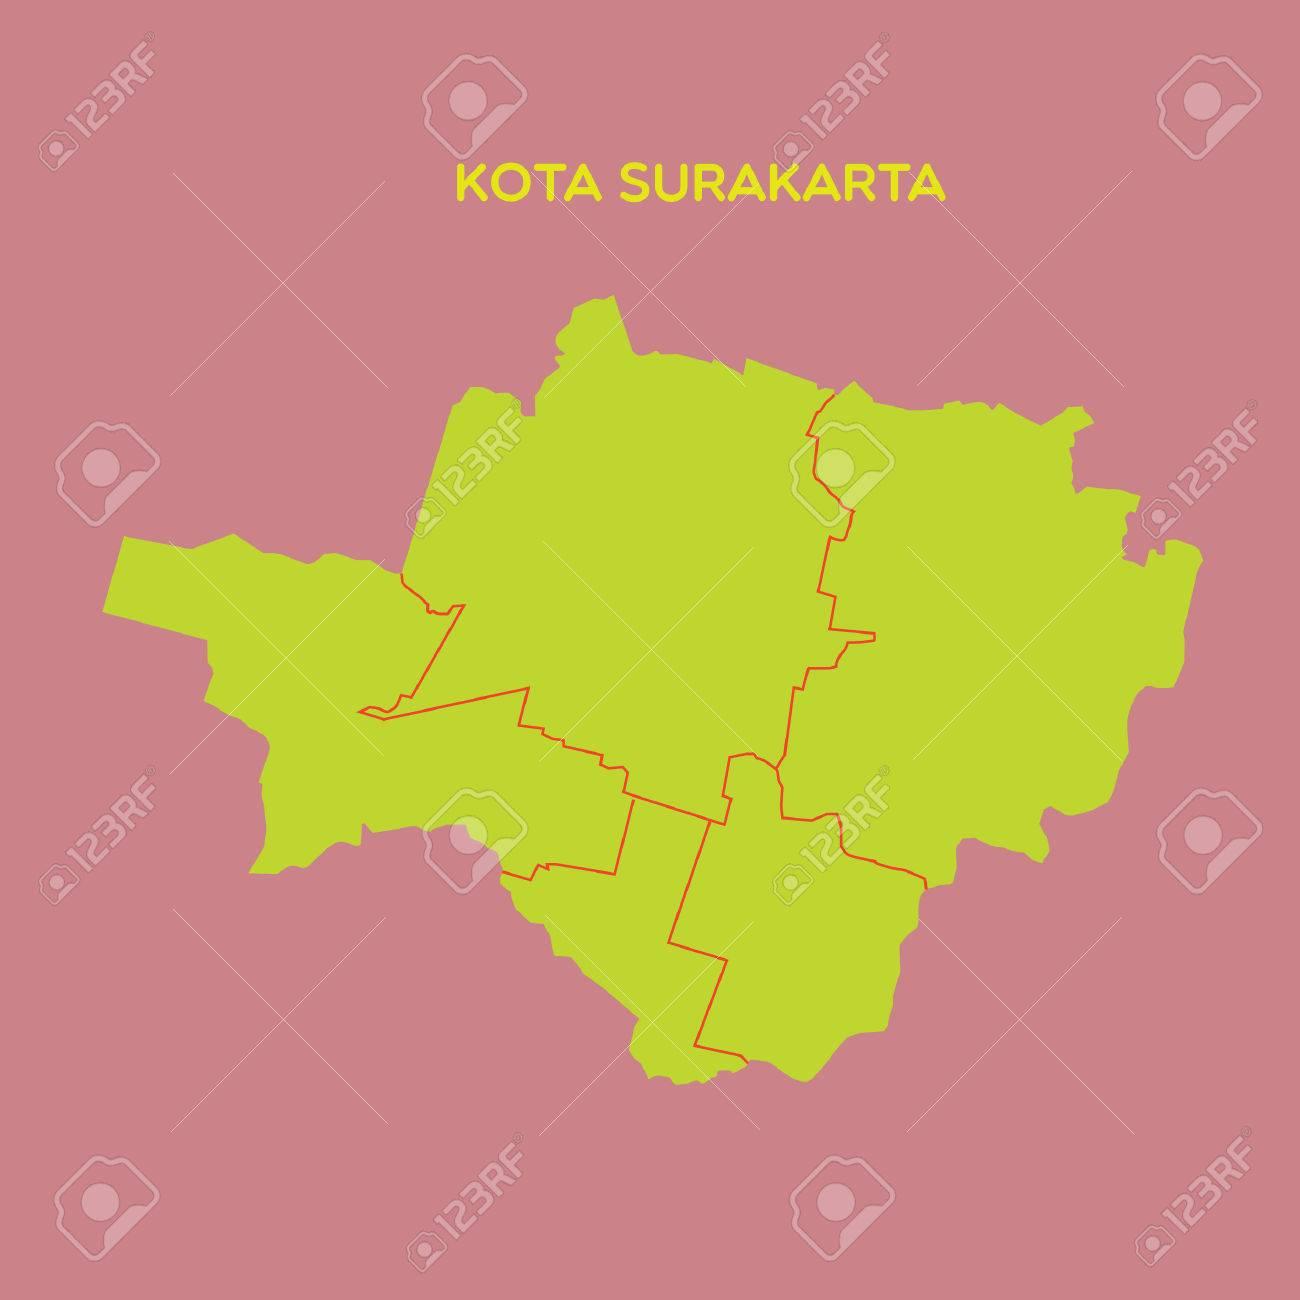 map of kota surakarta